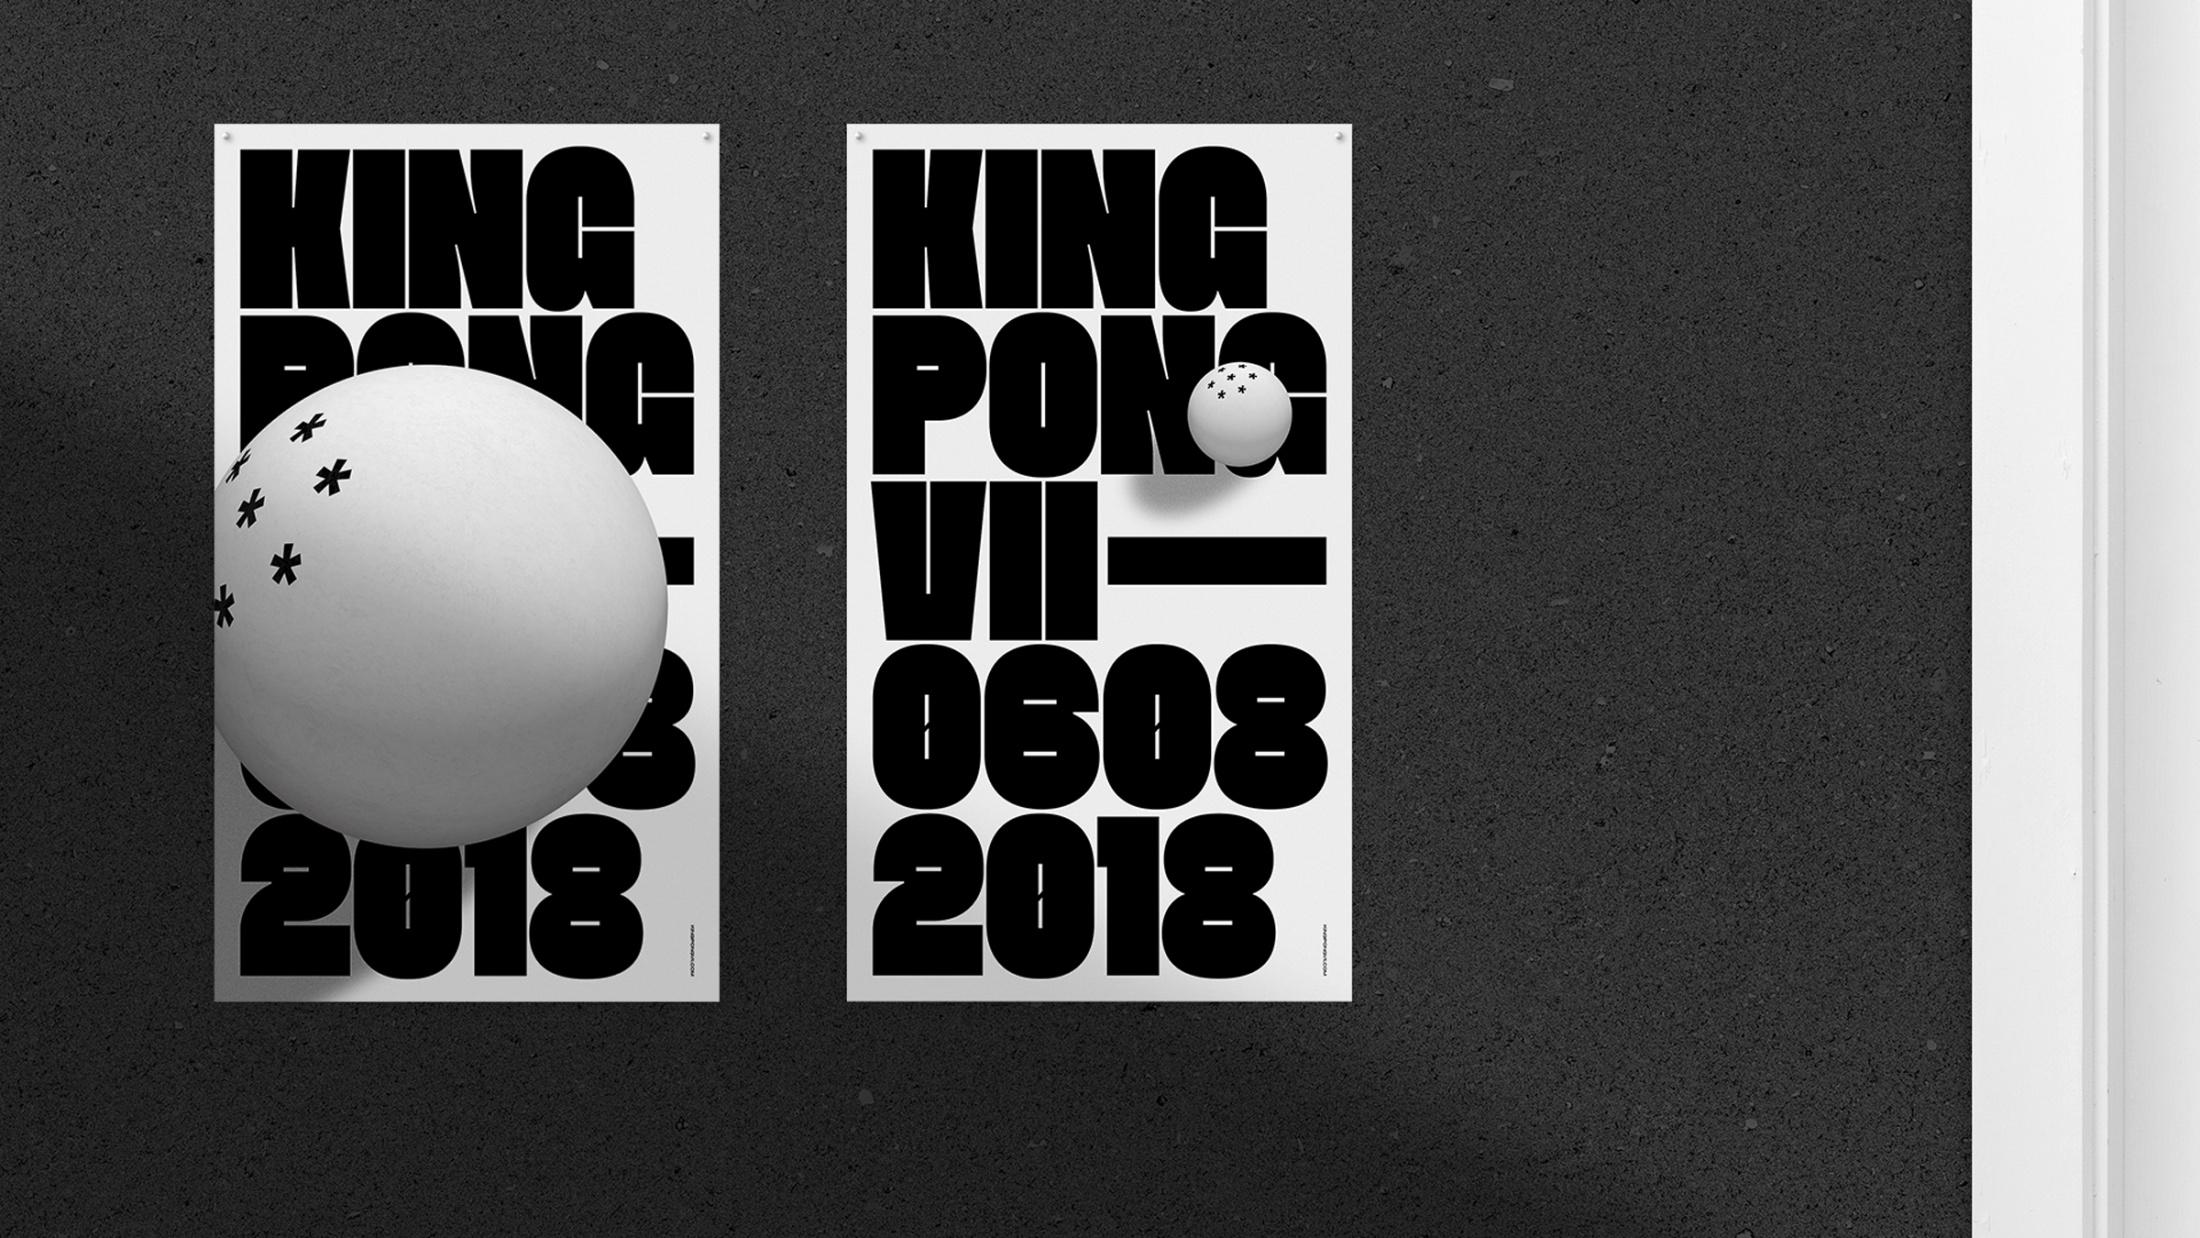 Thumbnail for King Pong VII